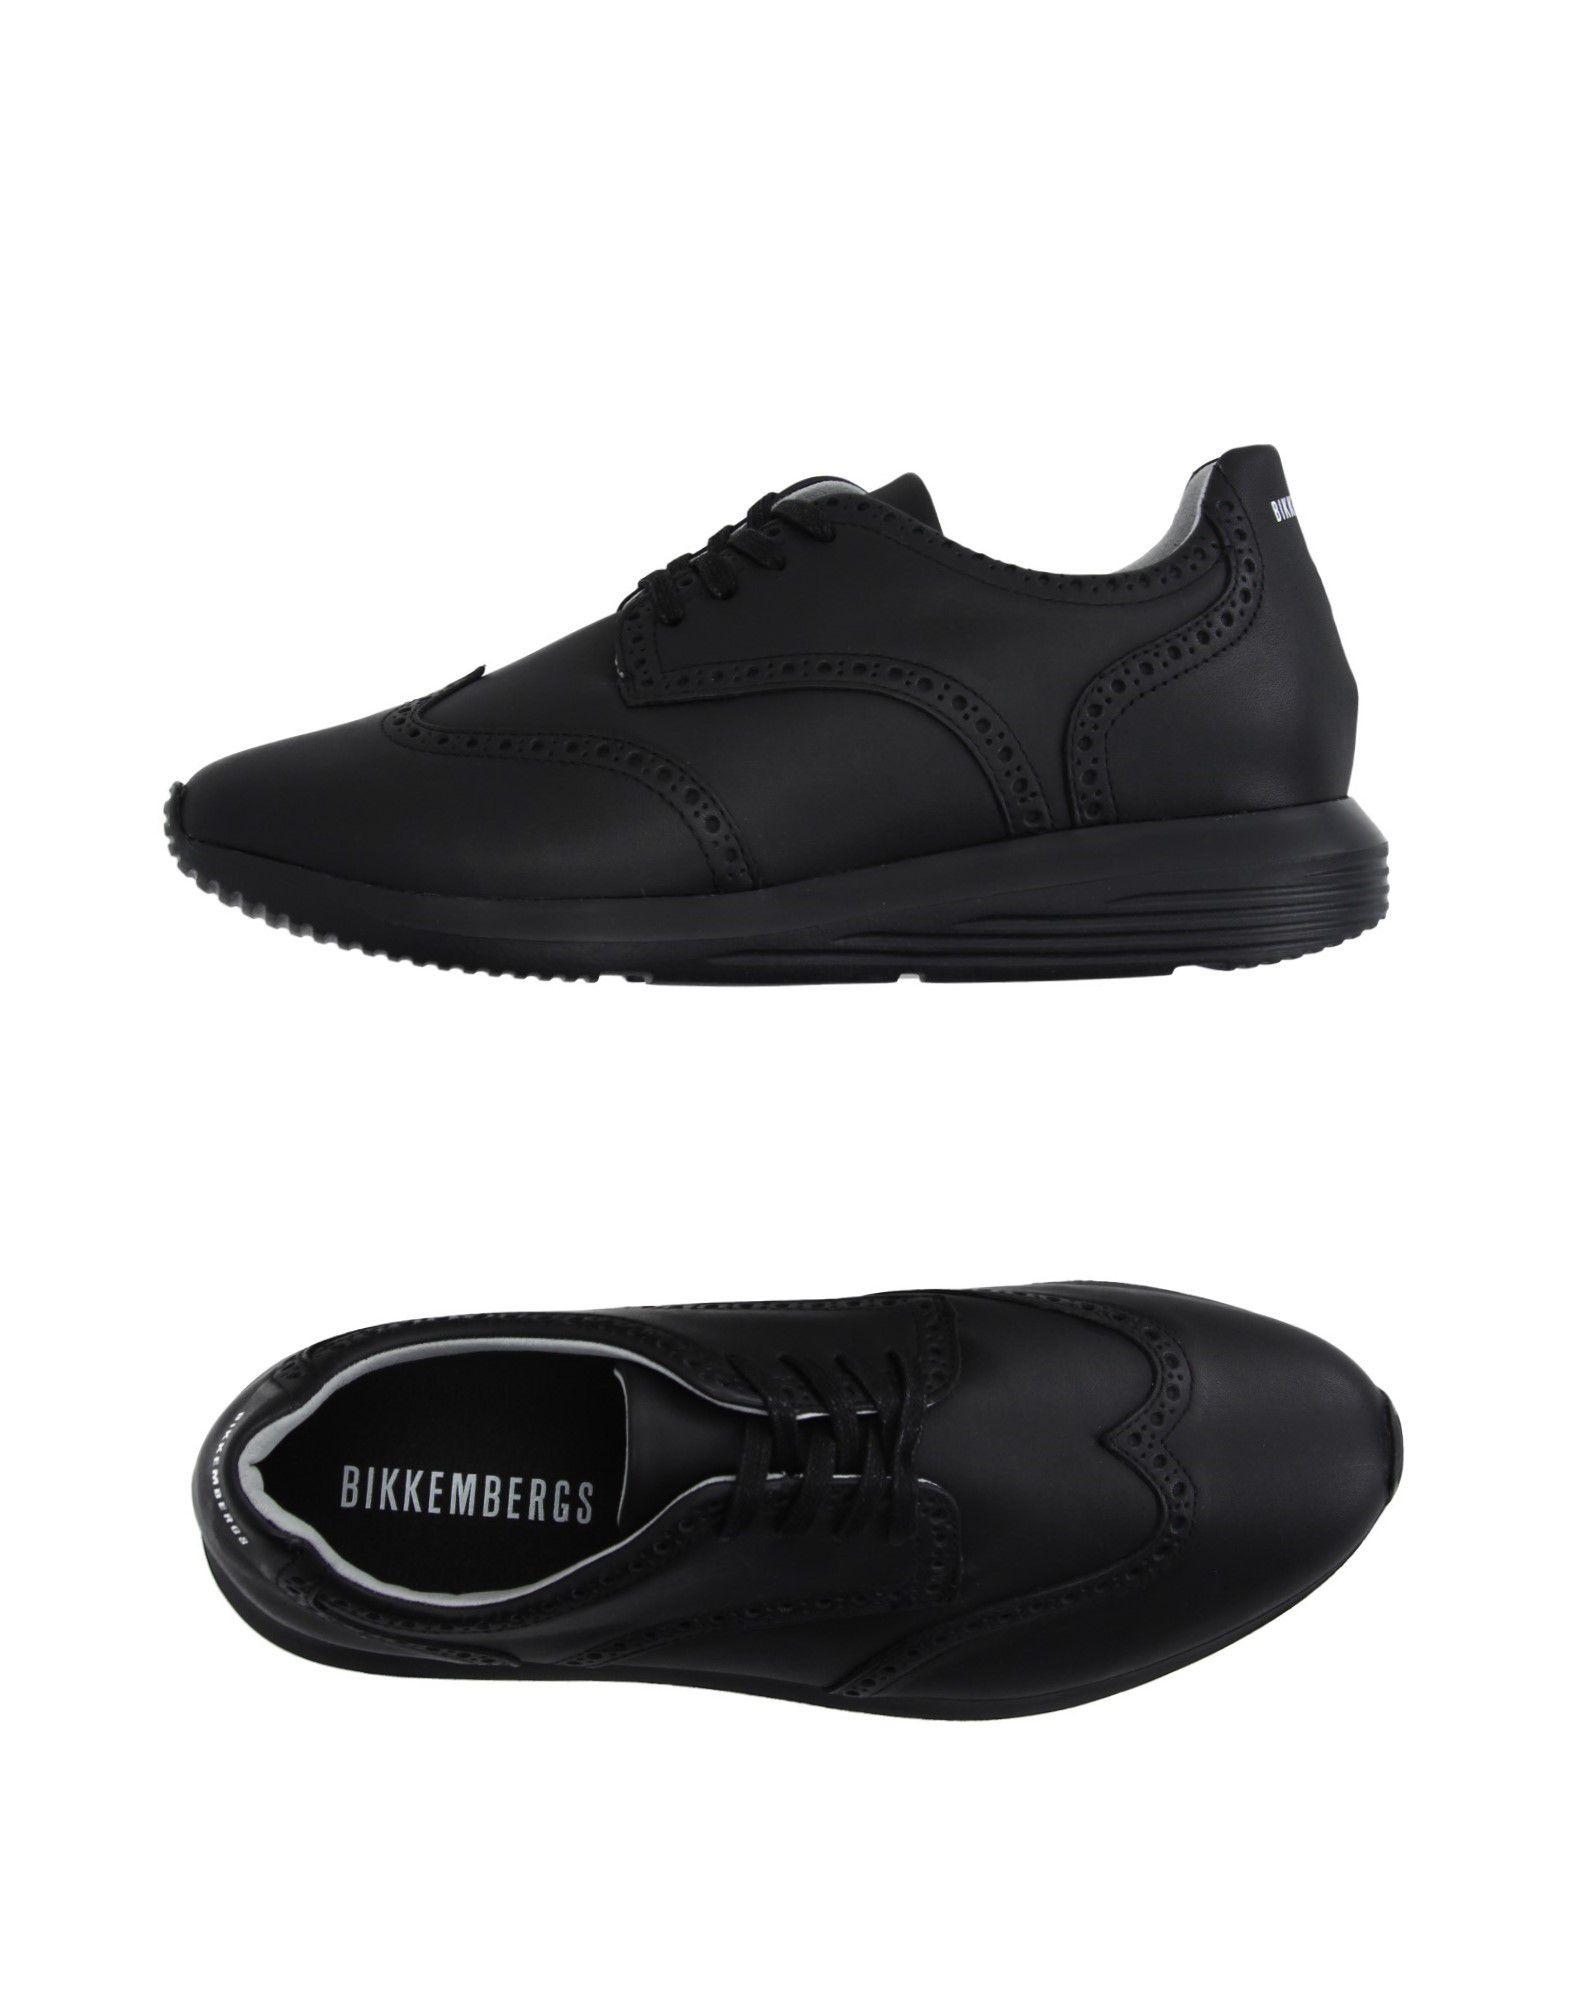 Bikkembergs Bikkembergs  Sneakers Herren  44999170HB 61d898